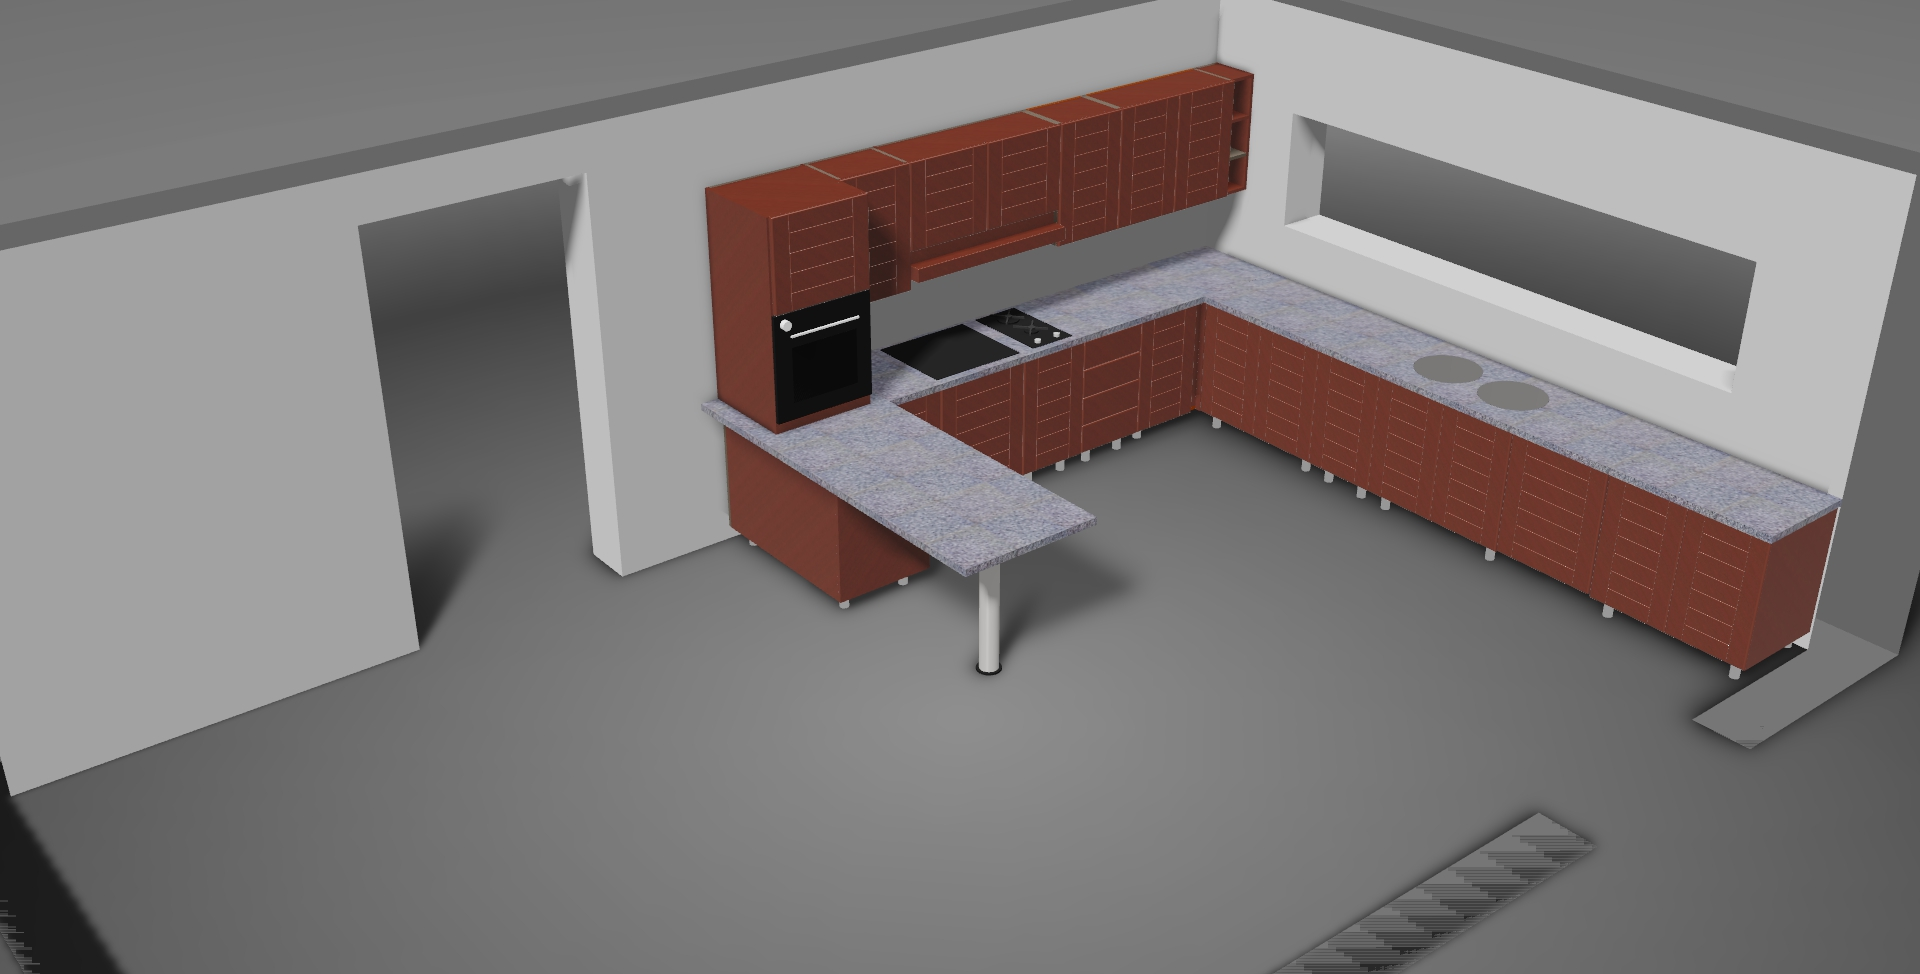 Disegno cucina 3d top disegnare la cucina in d images for Disegnare cucina 3d online